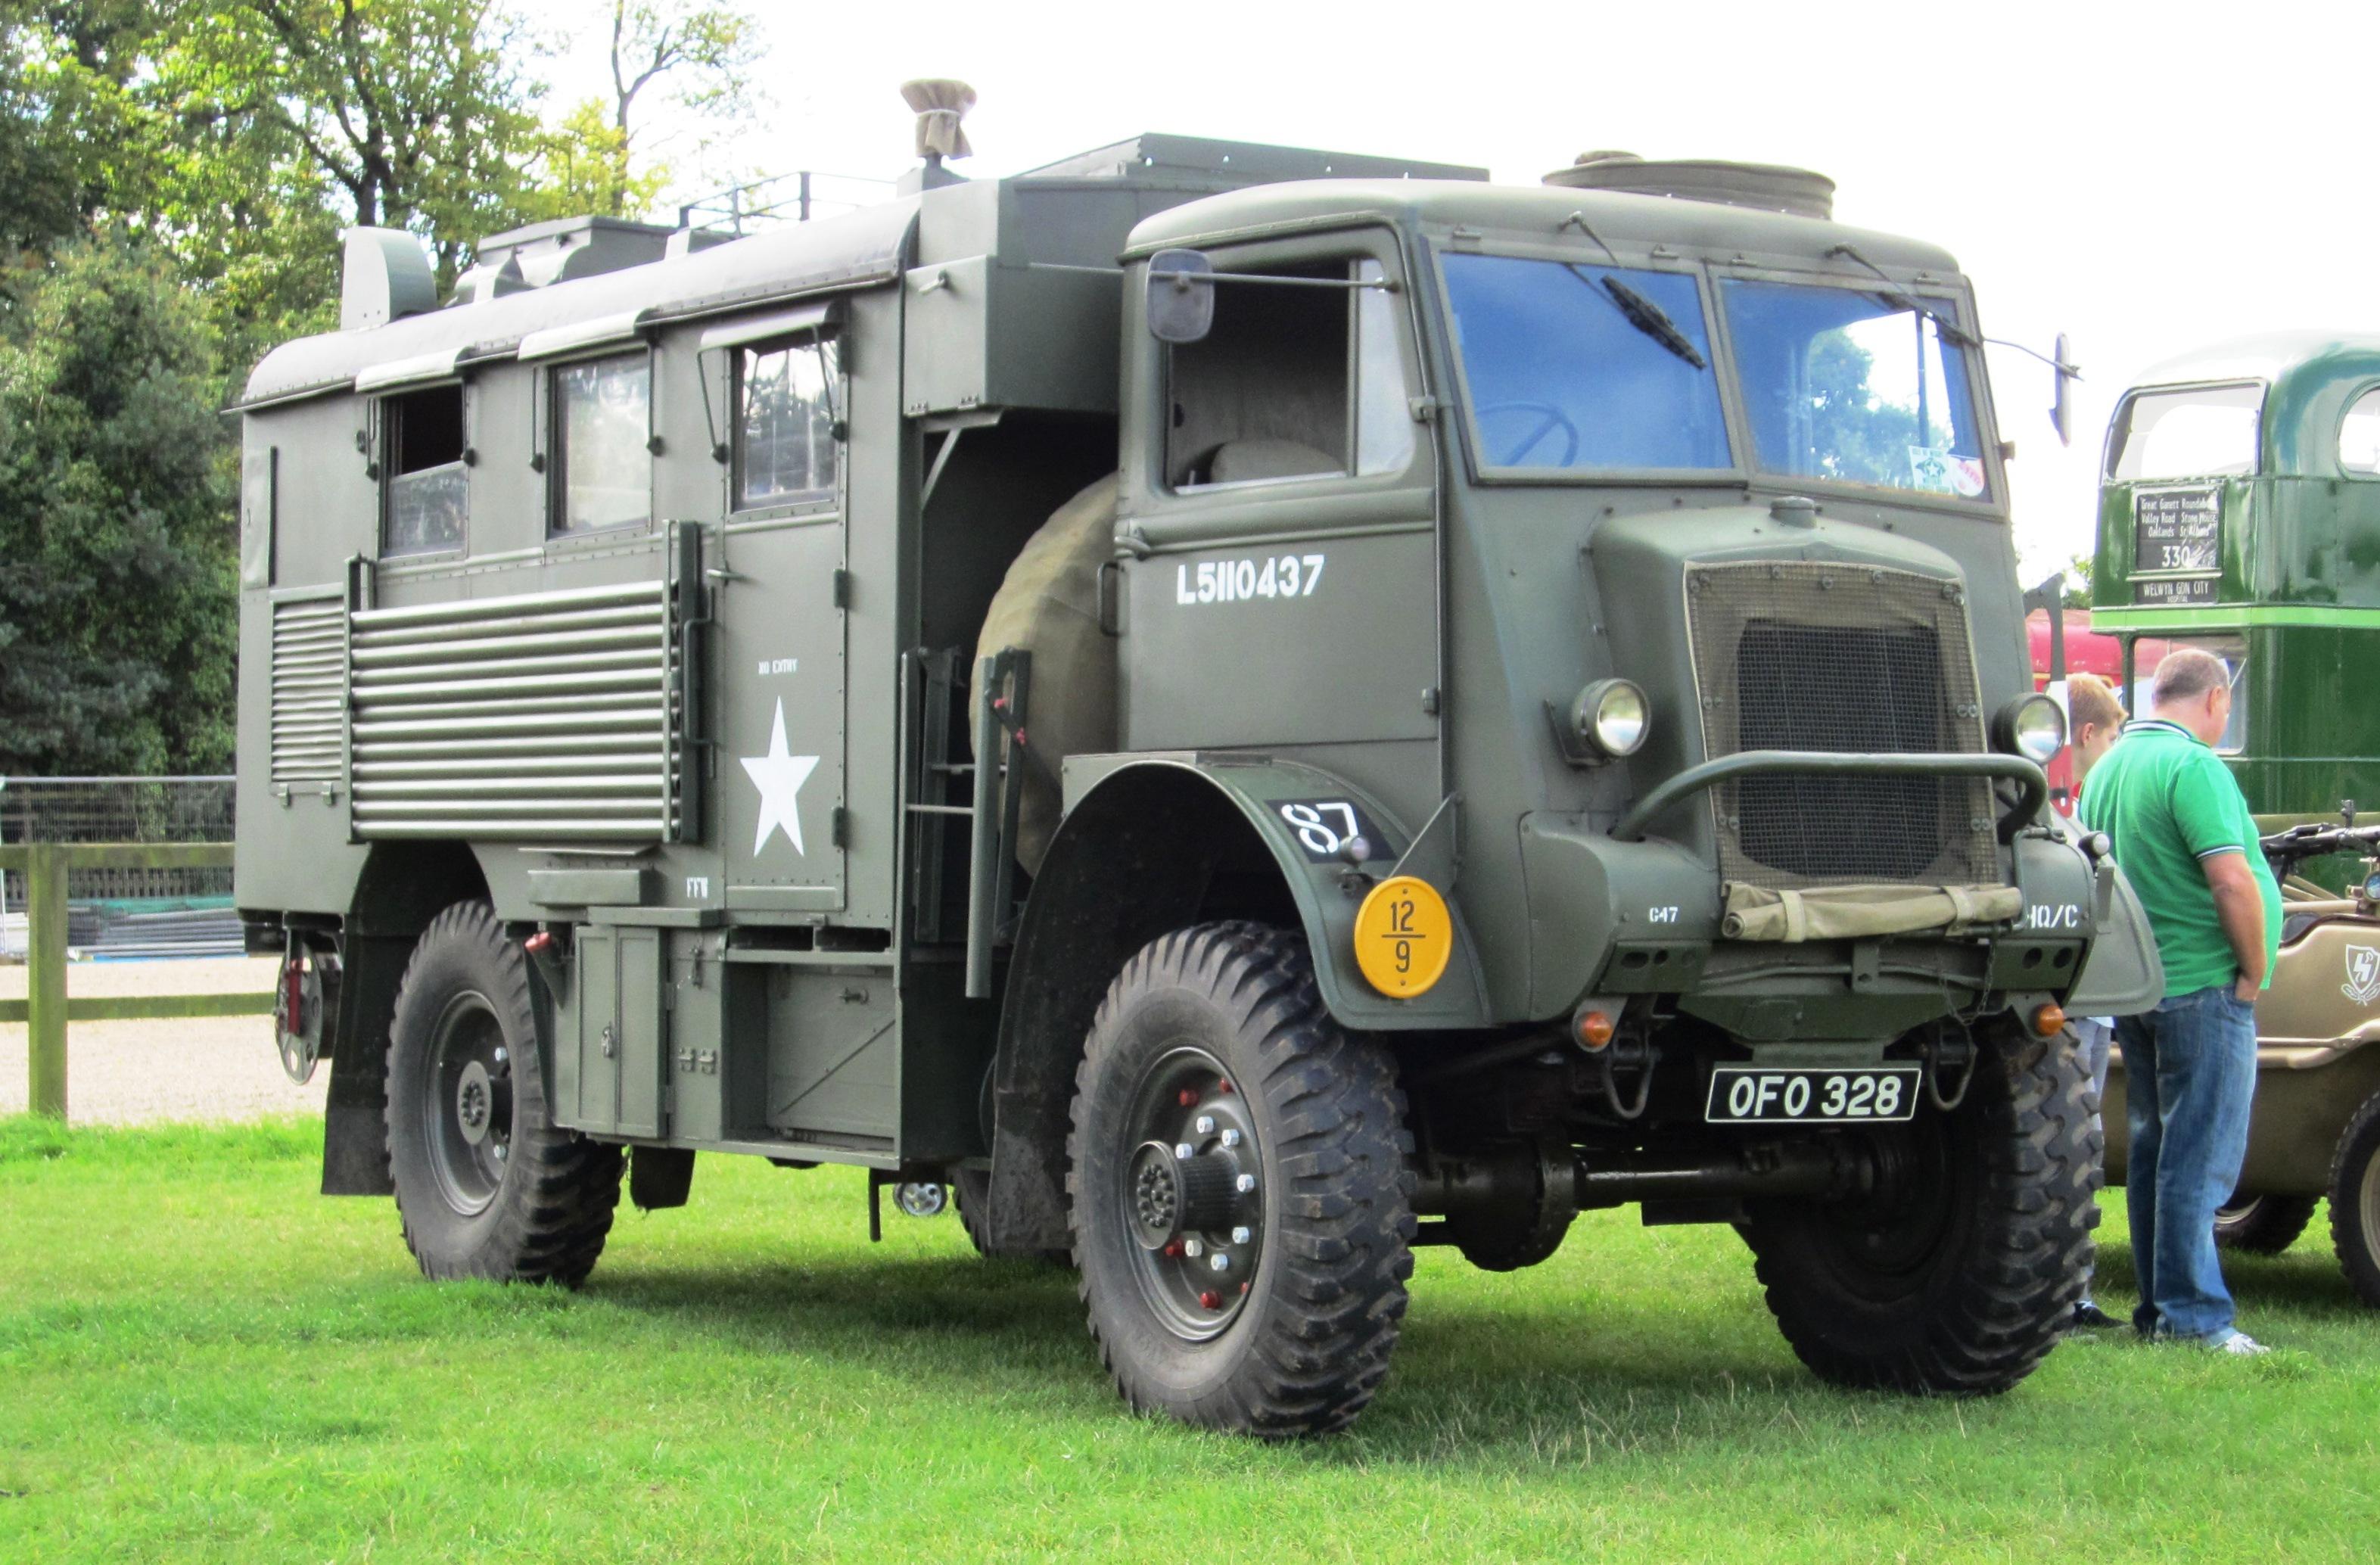 Ford 3 4 Ton Trucks Cars For Sale File:Bedford Q series truck 1944 2800cc.jpg - Wikimedia Commons